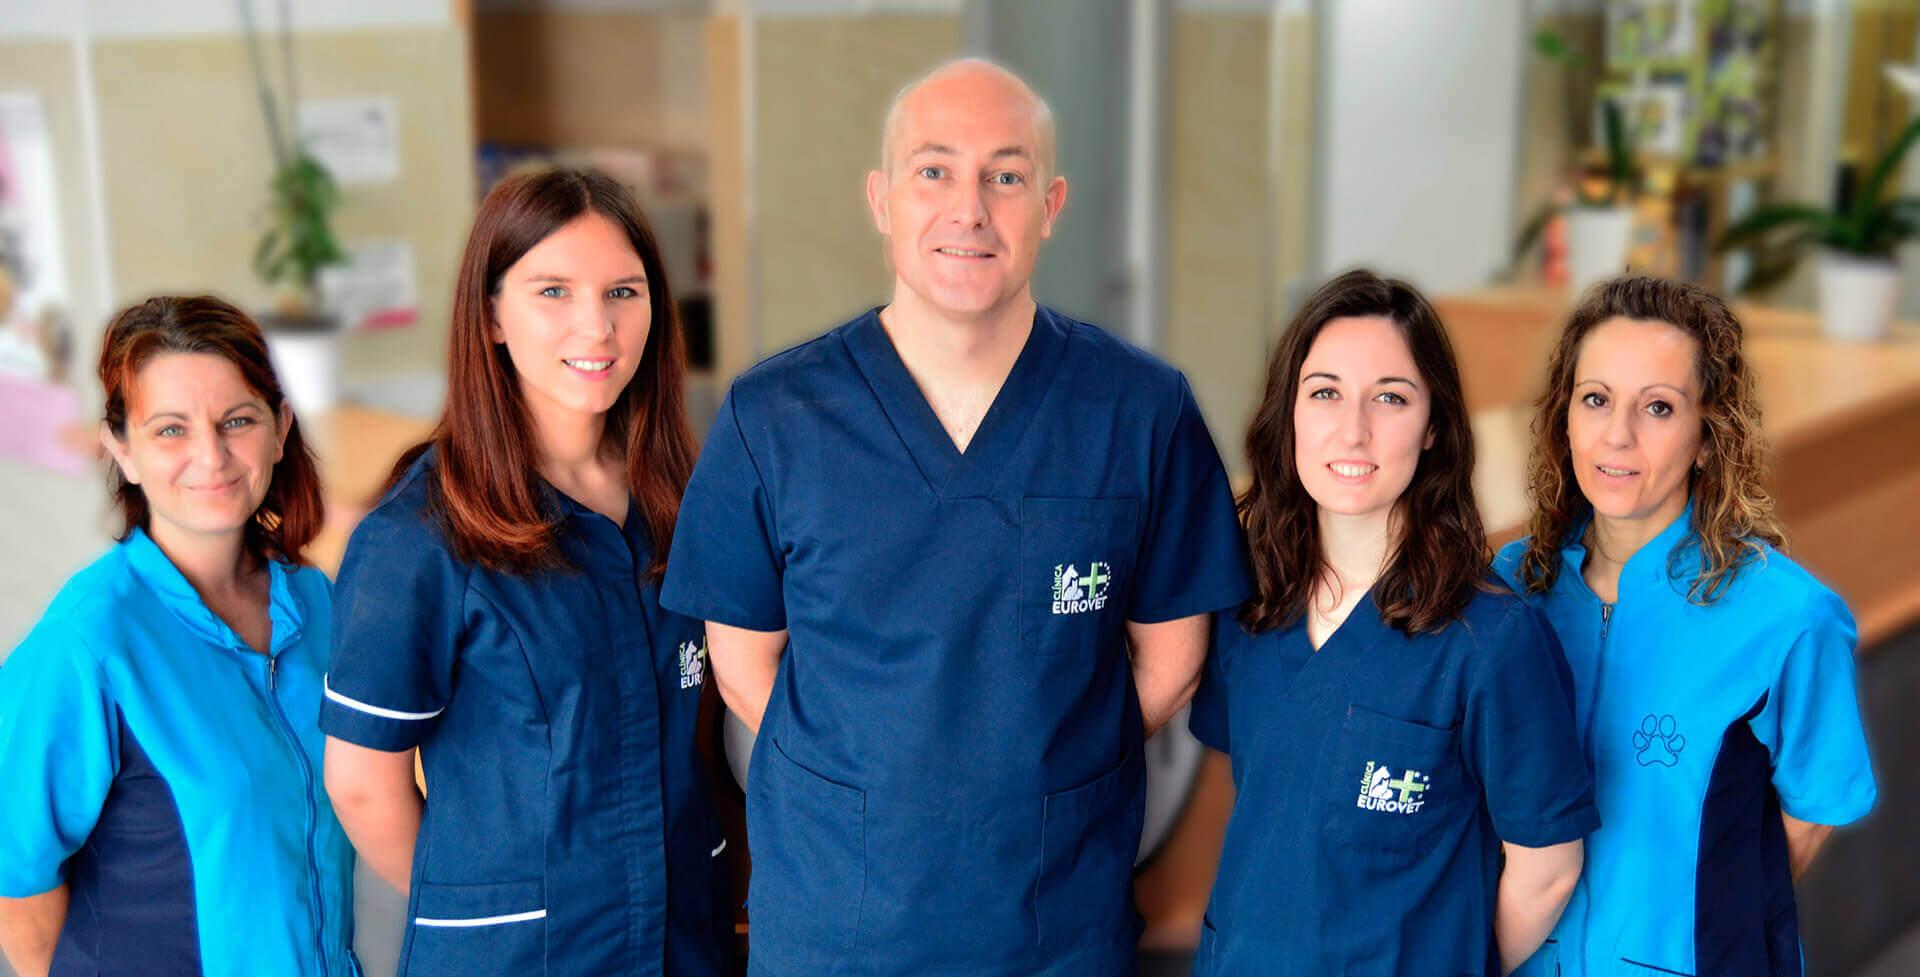 Clinica Veterinaria Eurovet Peñiscola Equipo